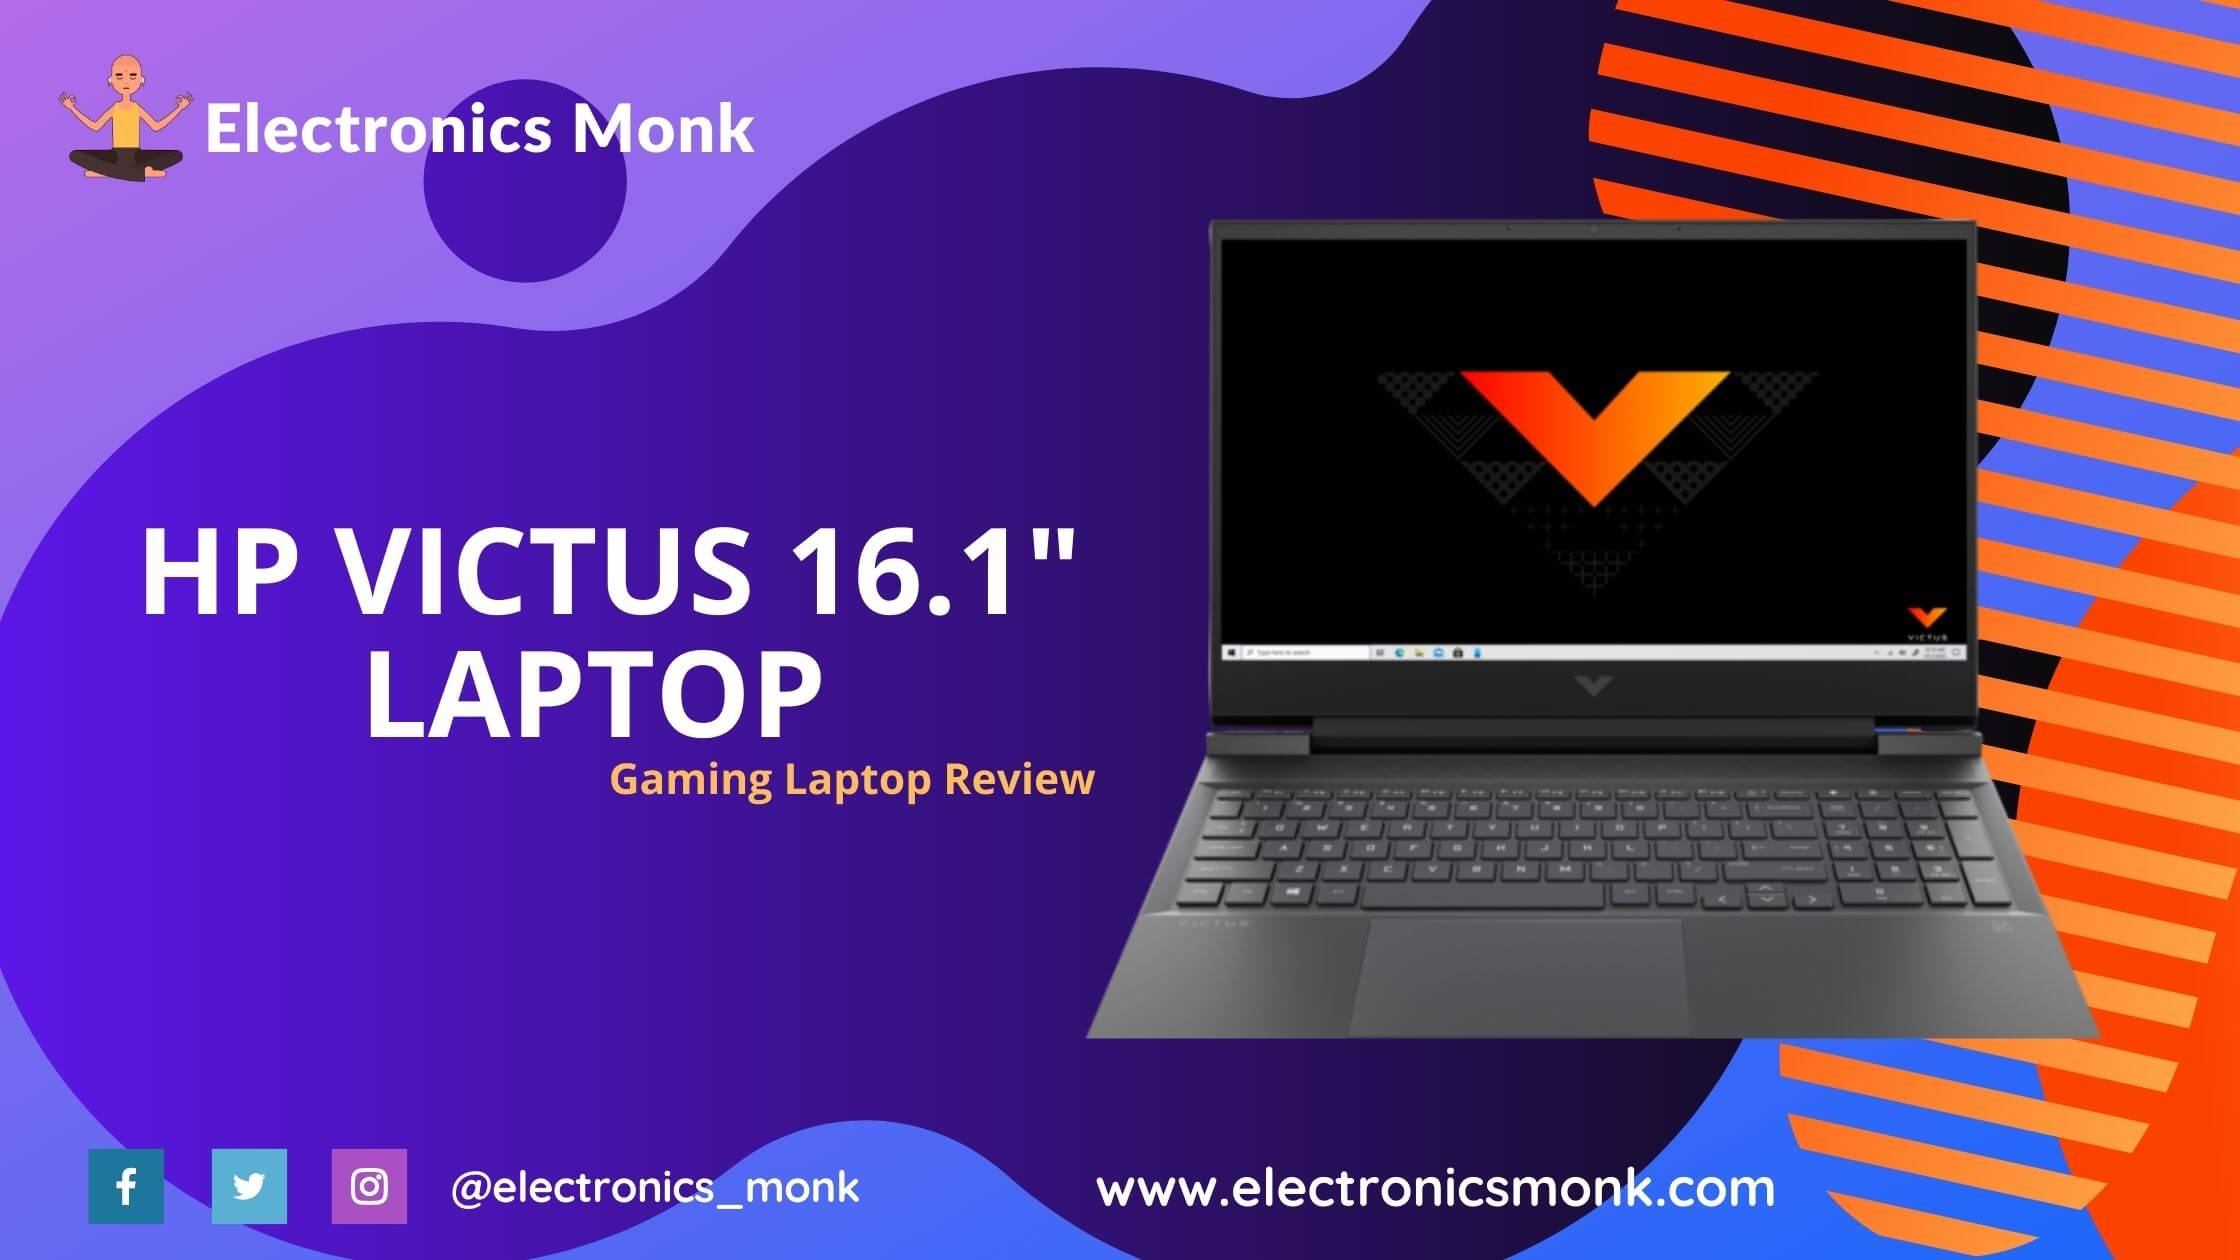 HP Victus 16.1 Gaming Laptop Review